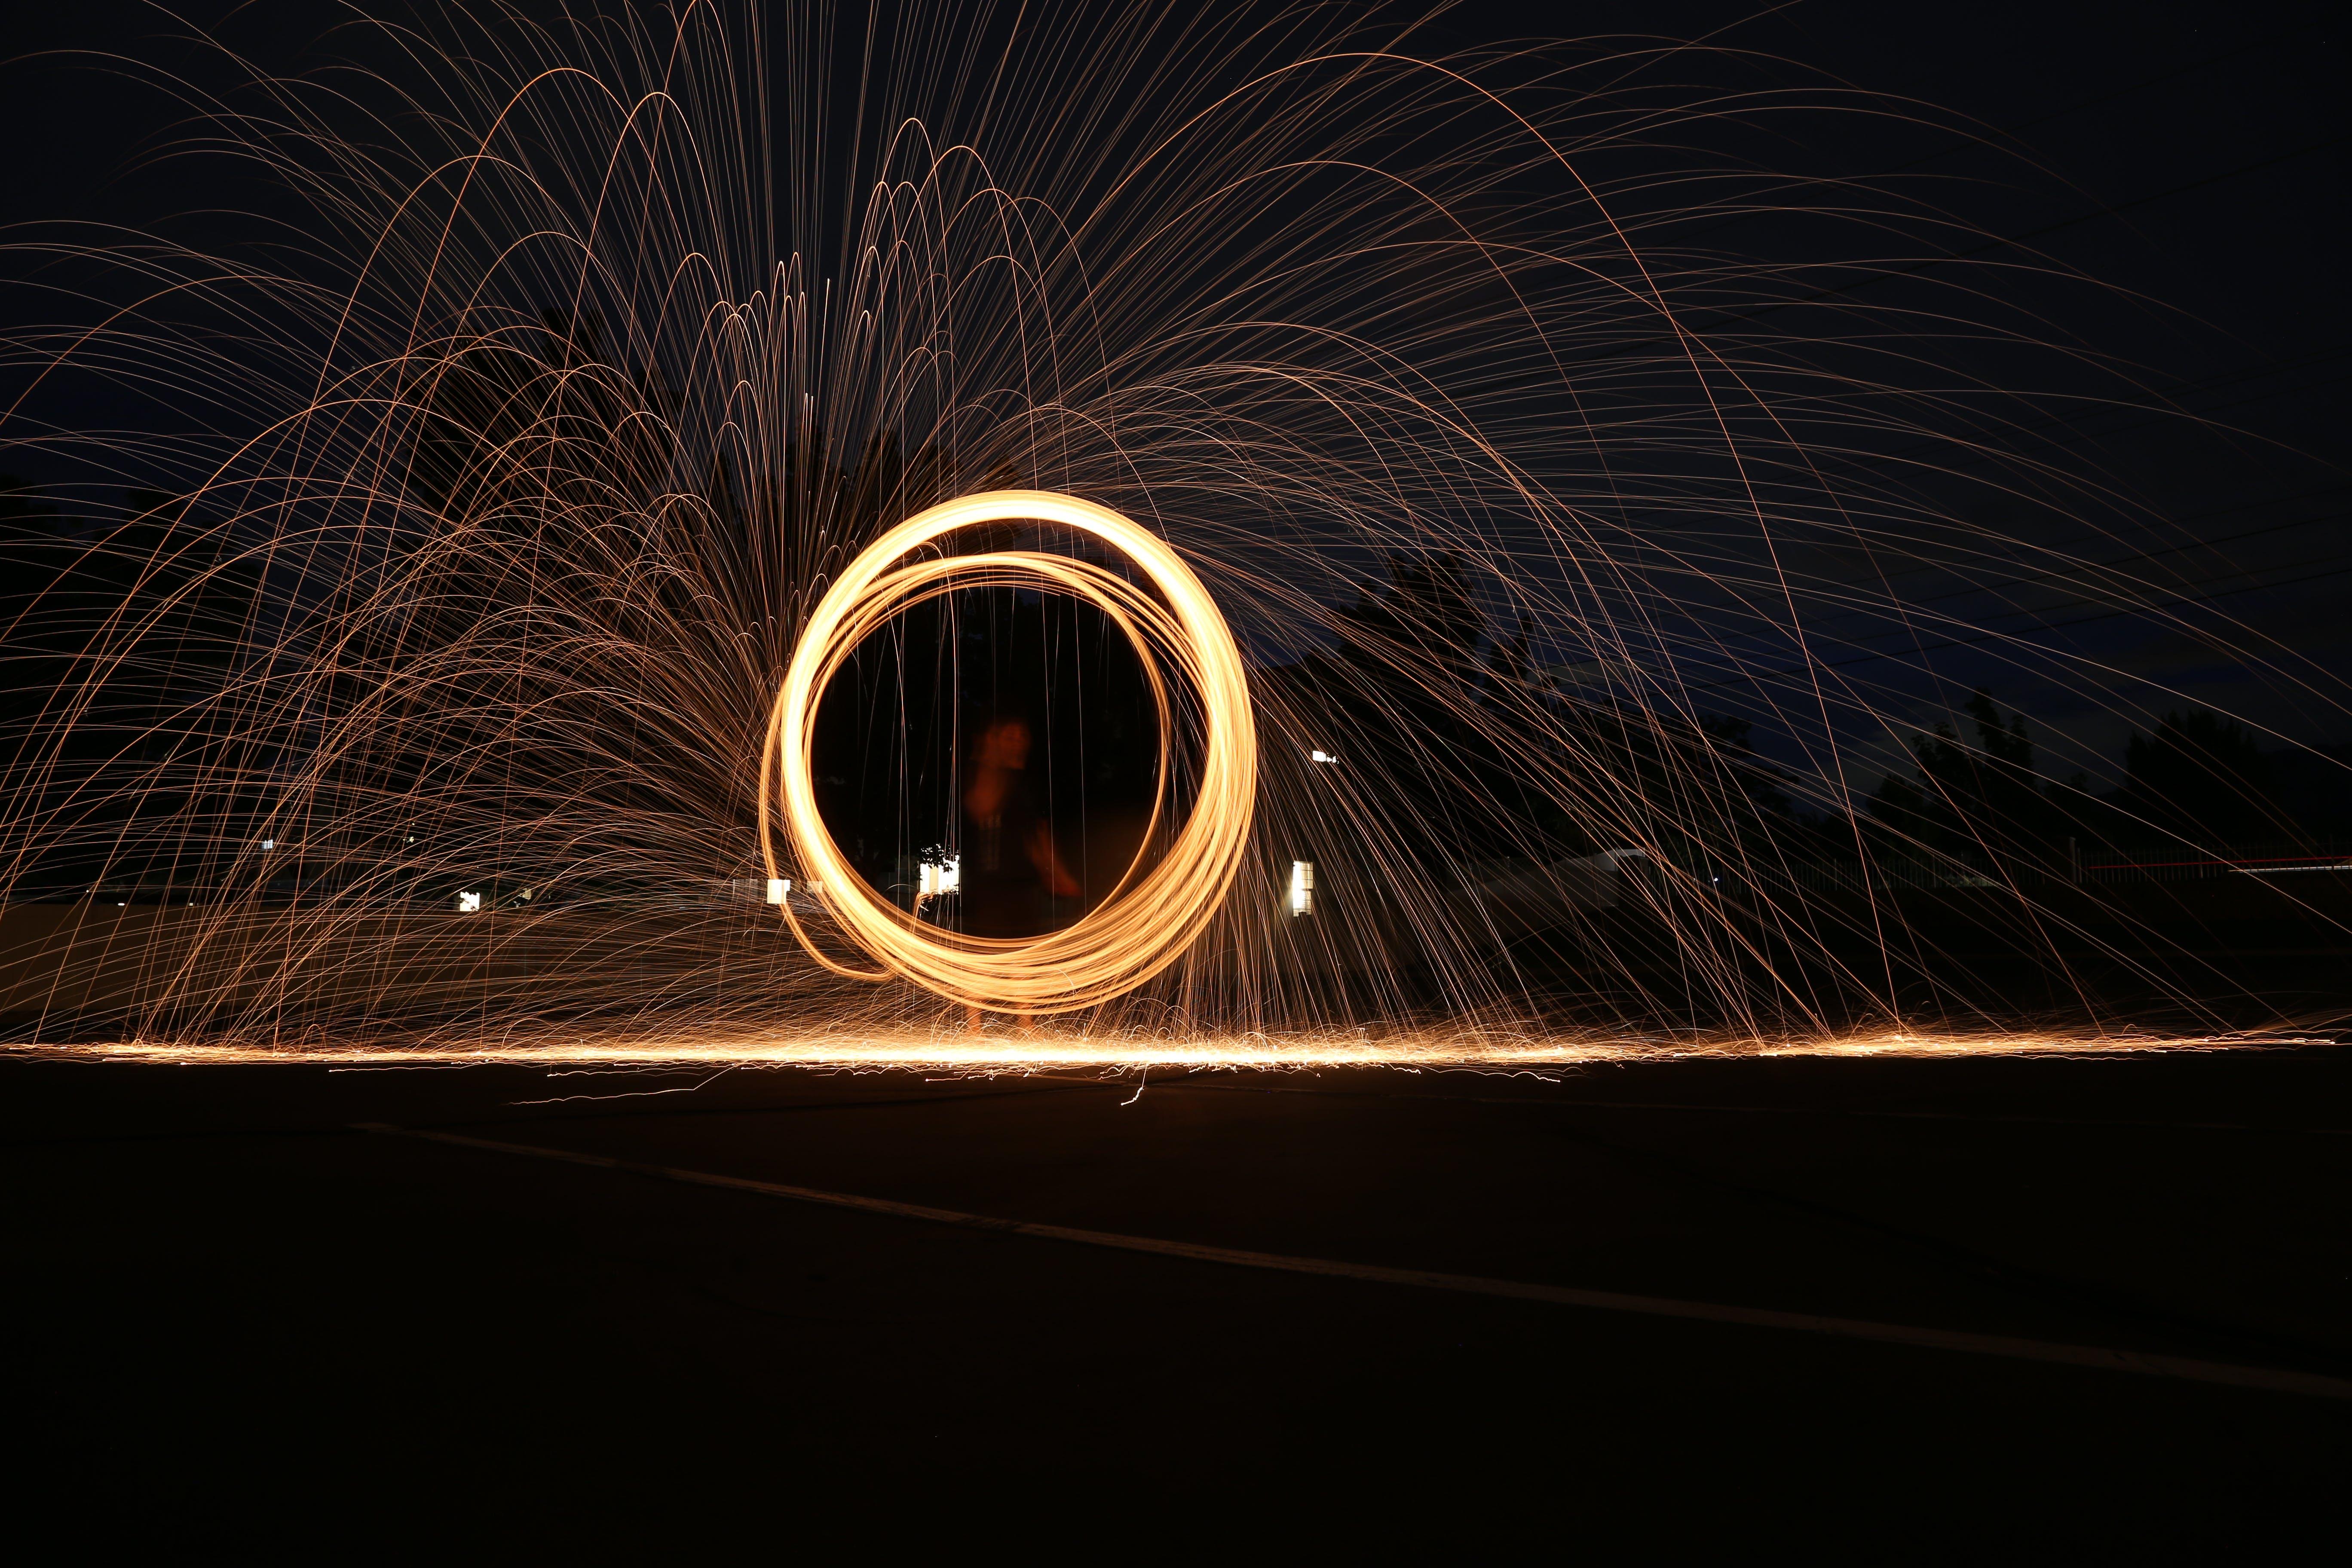 Free stock photo of light, night, painting, fire